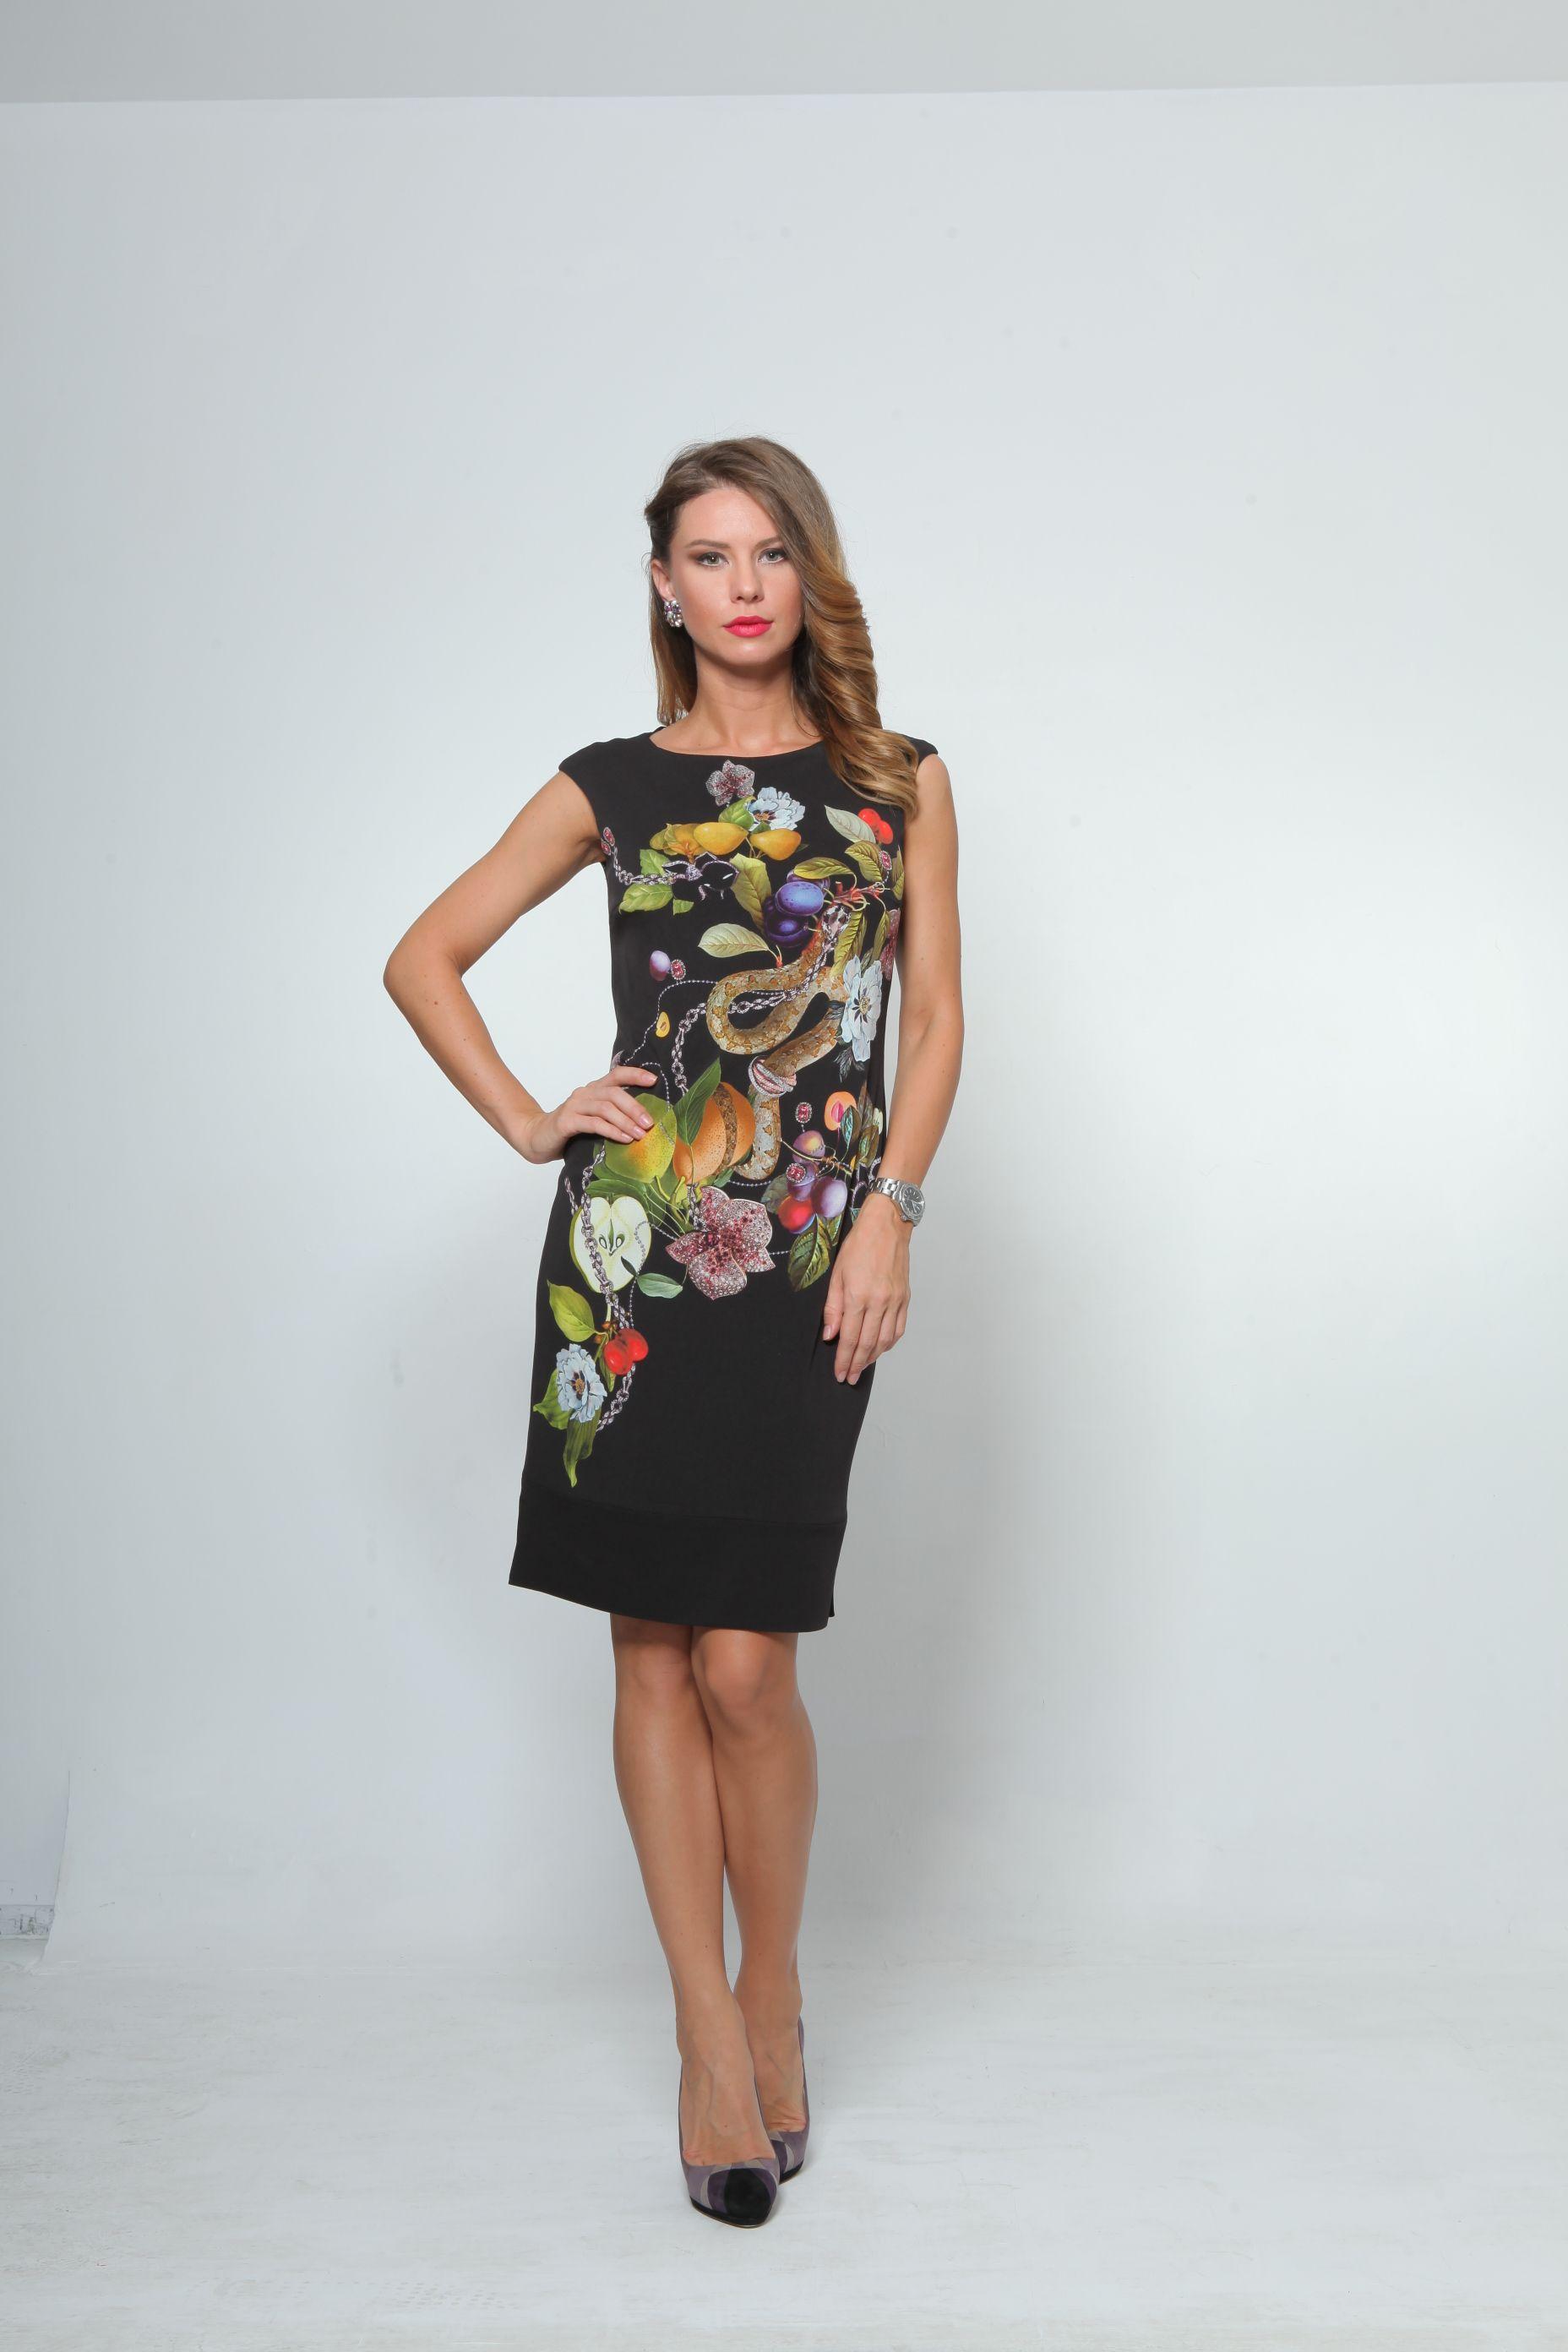 Rochie Eleganta Botez Colectie Pentru Ocazii Speciale Dresses